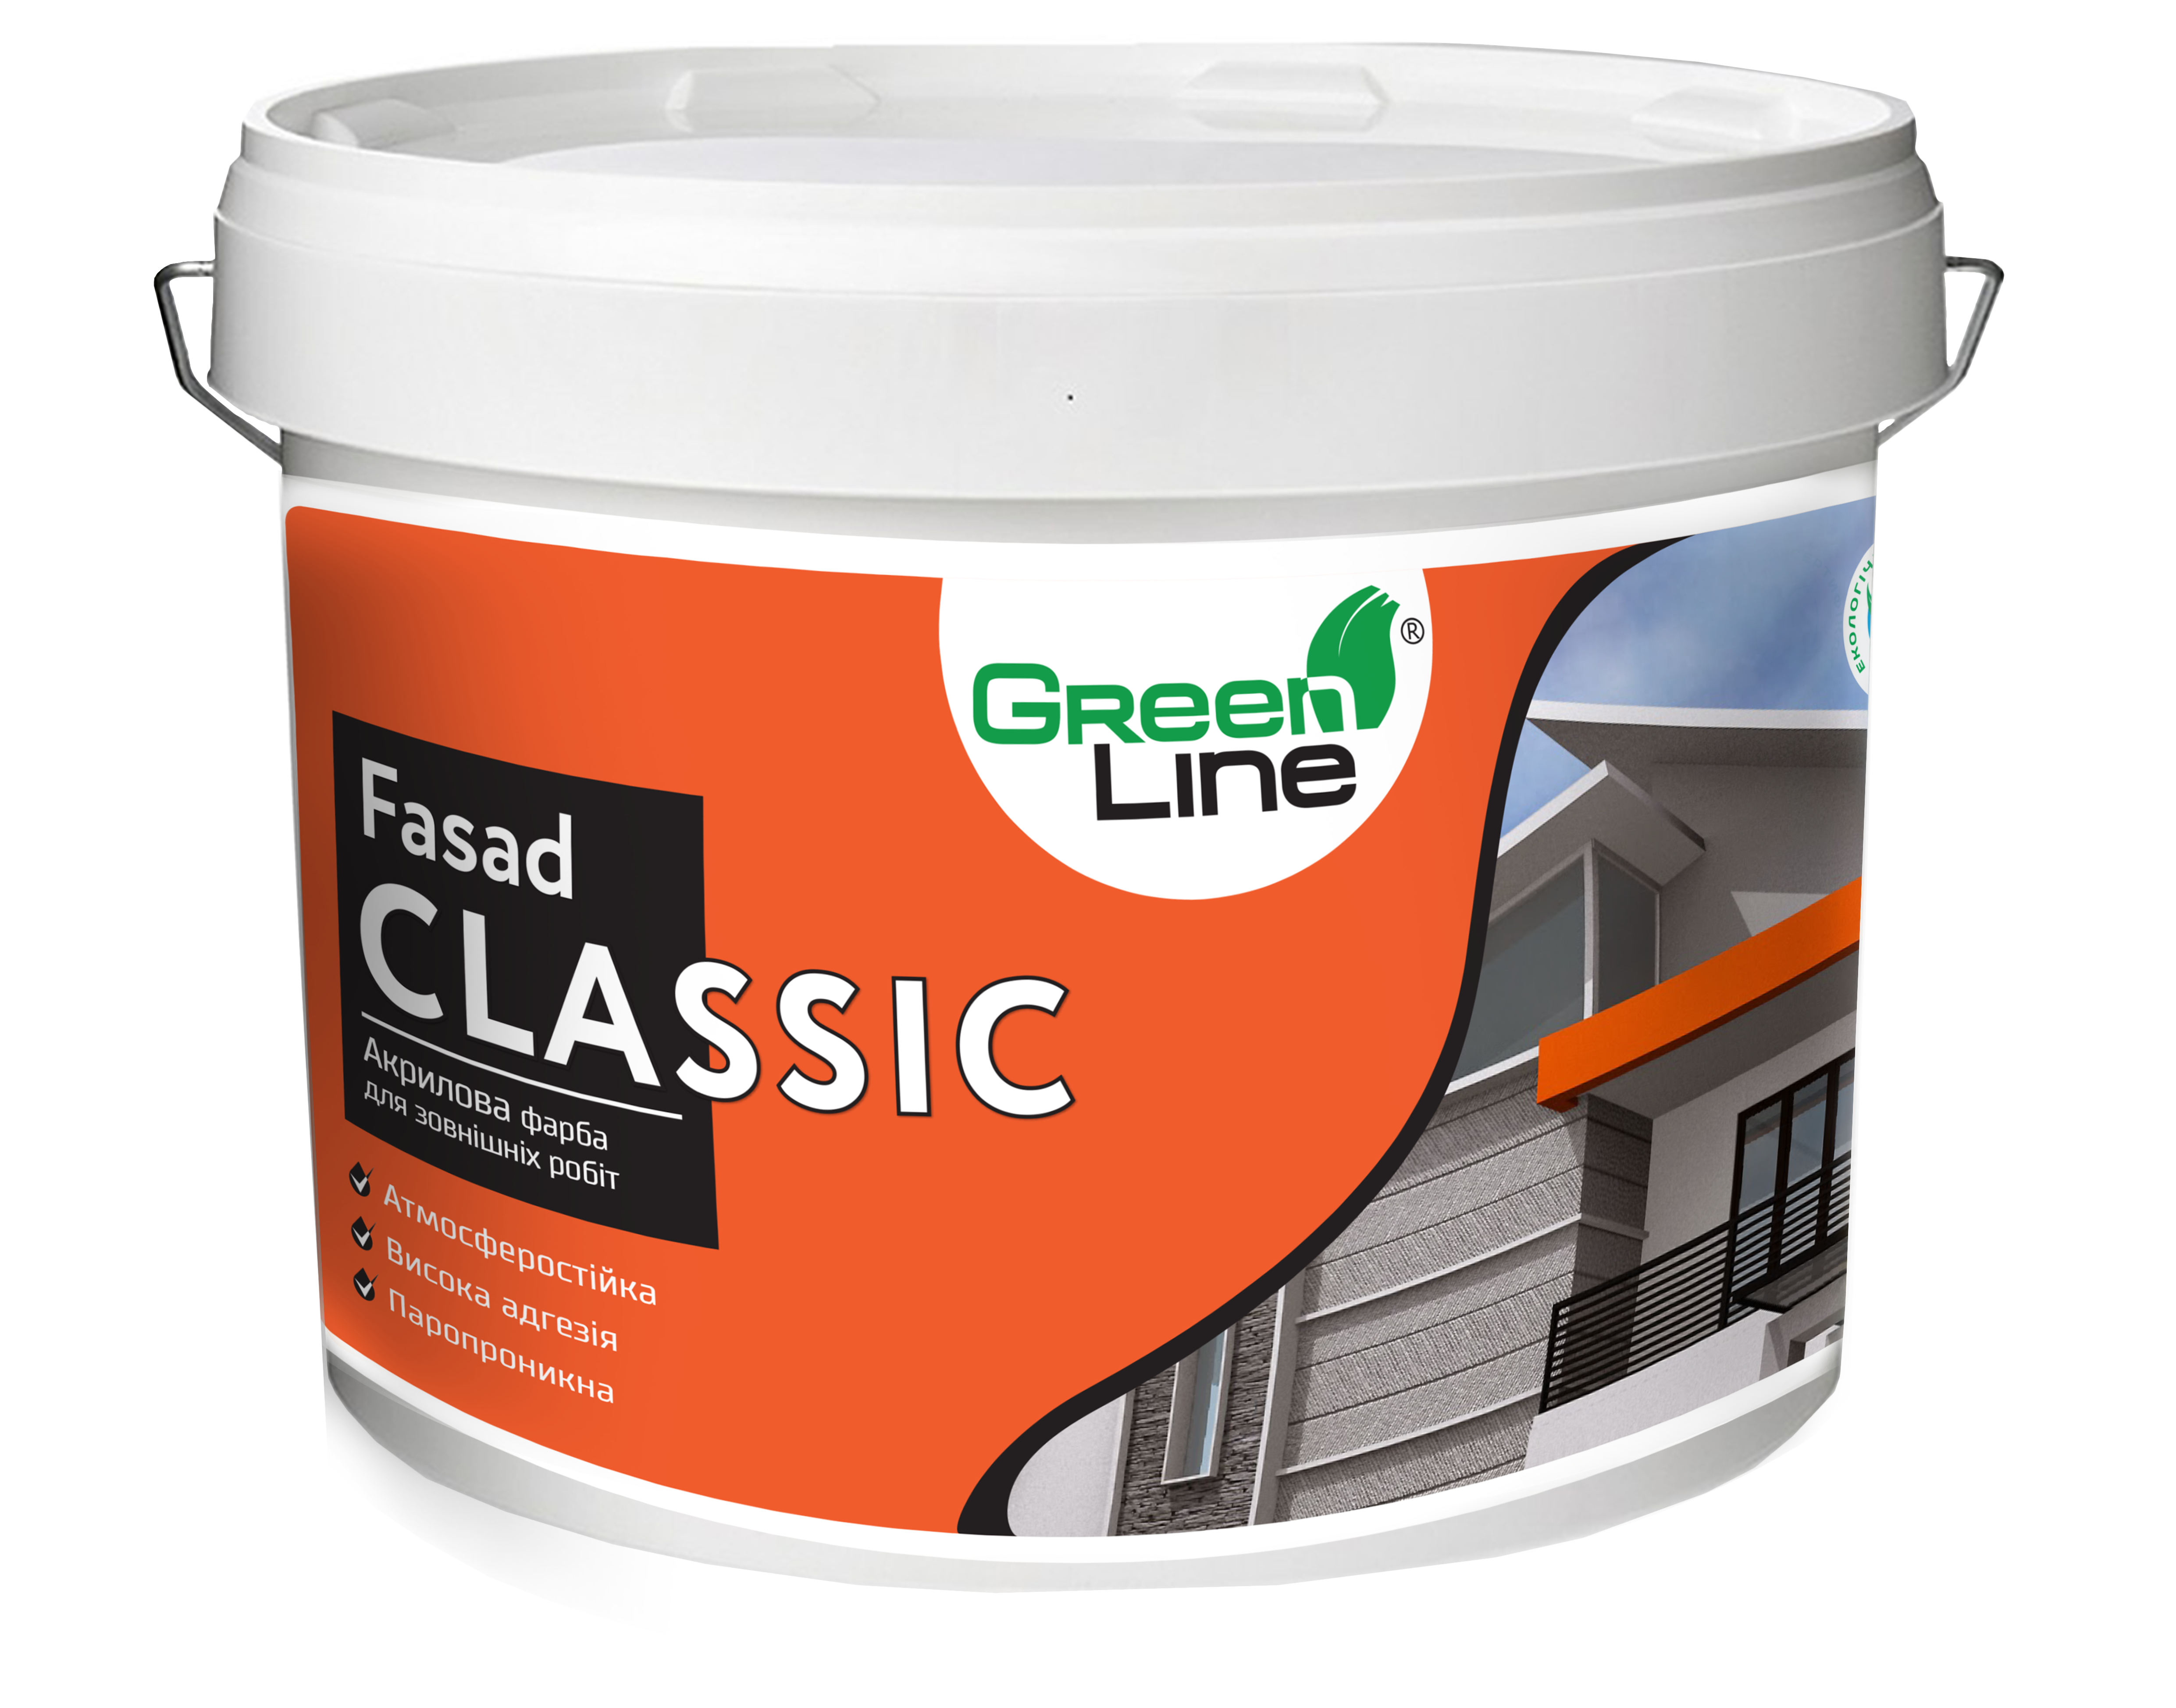 FASAD CLASSIC